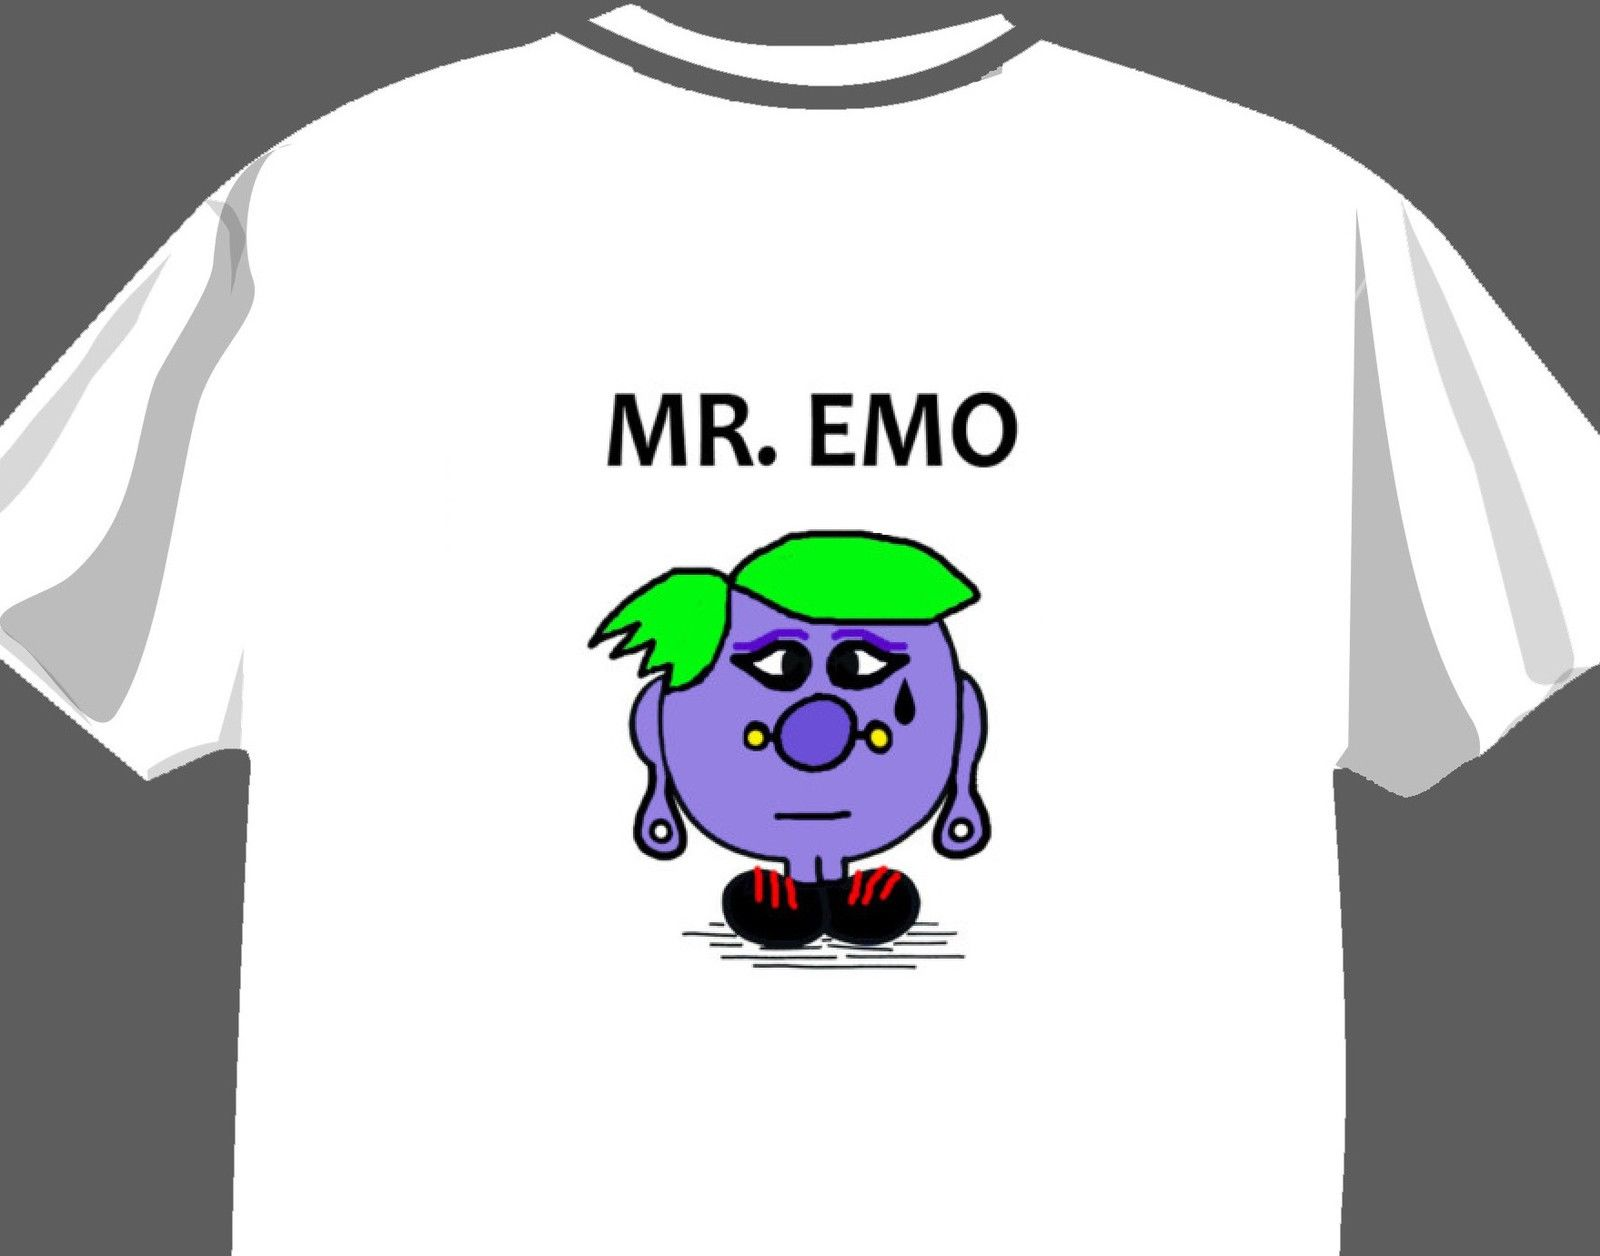 Sr. EMO, camiseta divertida de la parodia de MR Men/Miss. Little, camiseta de adulto, camiseta de dibujos animados, camiseta Unisex para hombres, nueva camiseta de moda